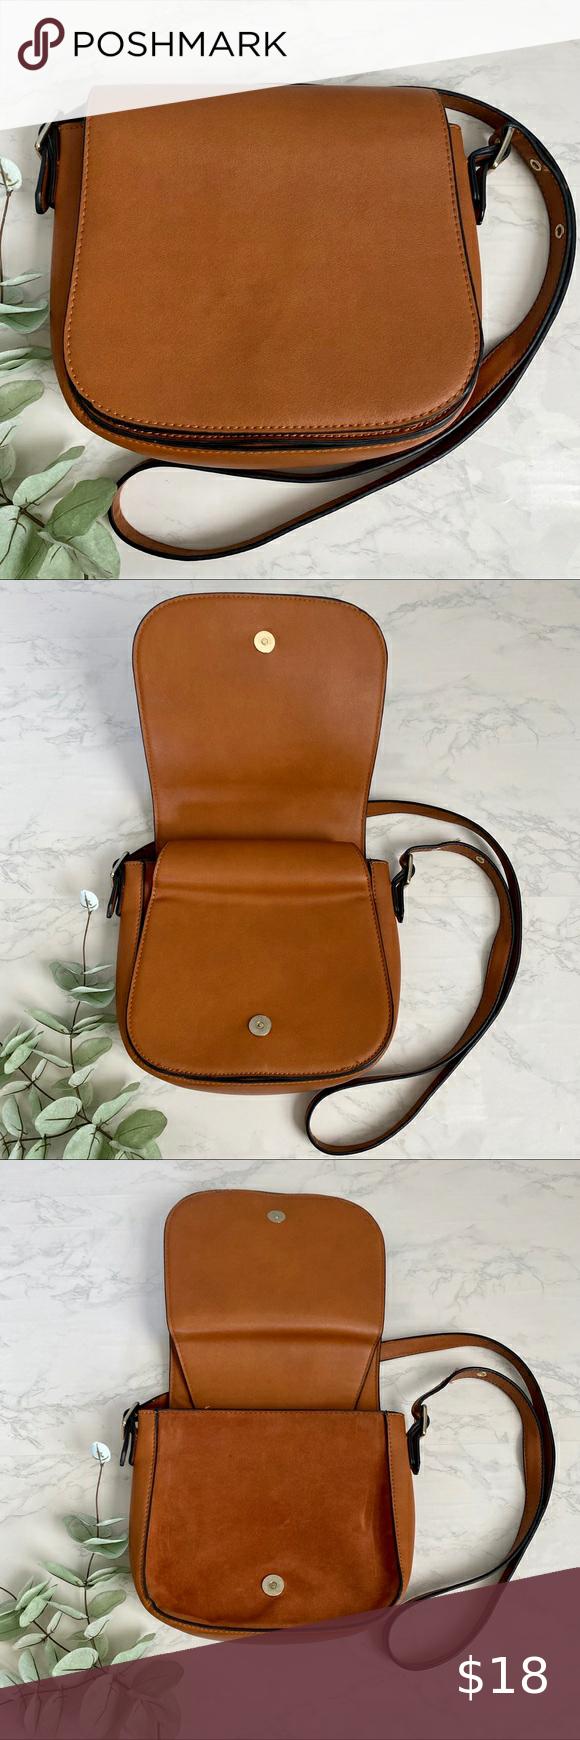 Minimalist Crossbody Messenger Vegan Leather Bag In 2020 Vegan Leather Bag Crossbody Messenger Leather Bag